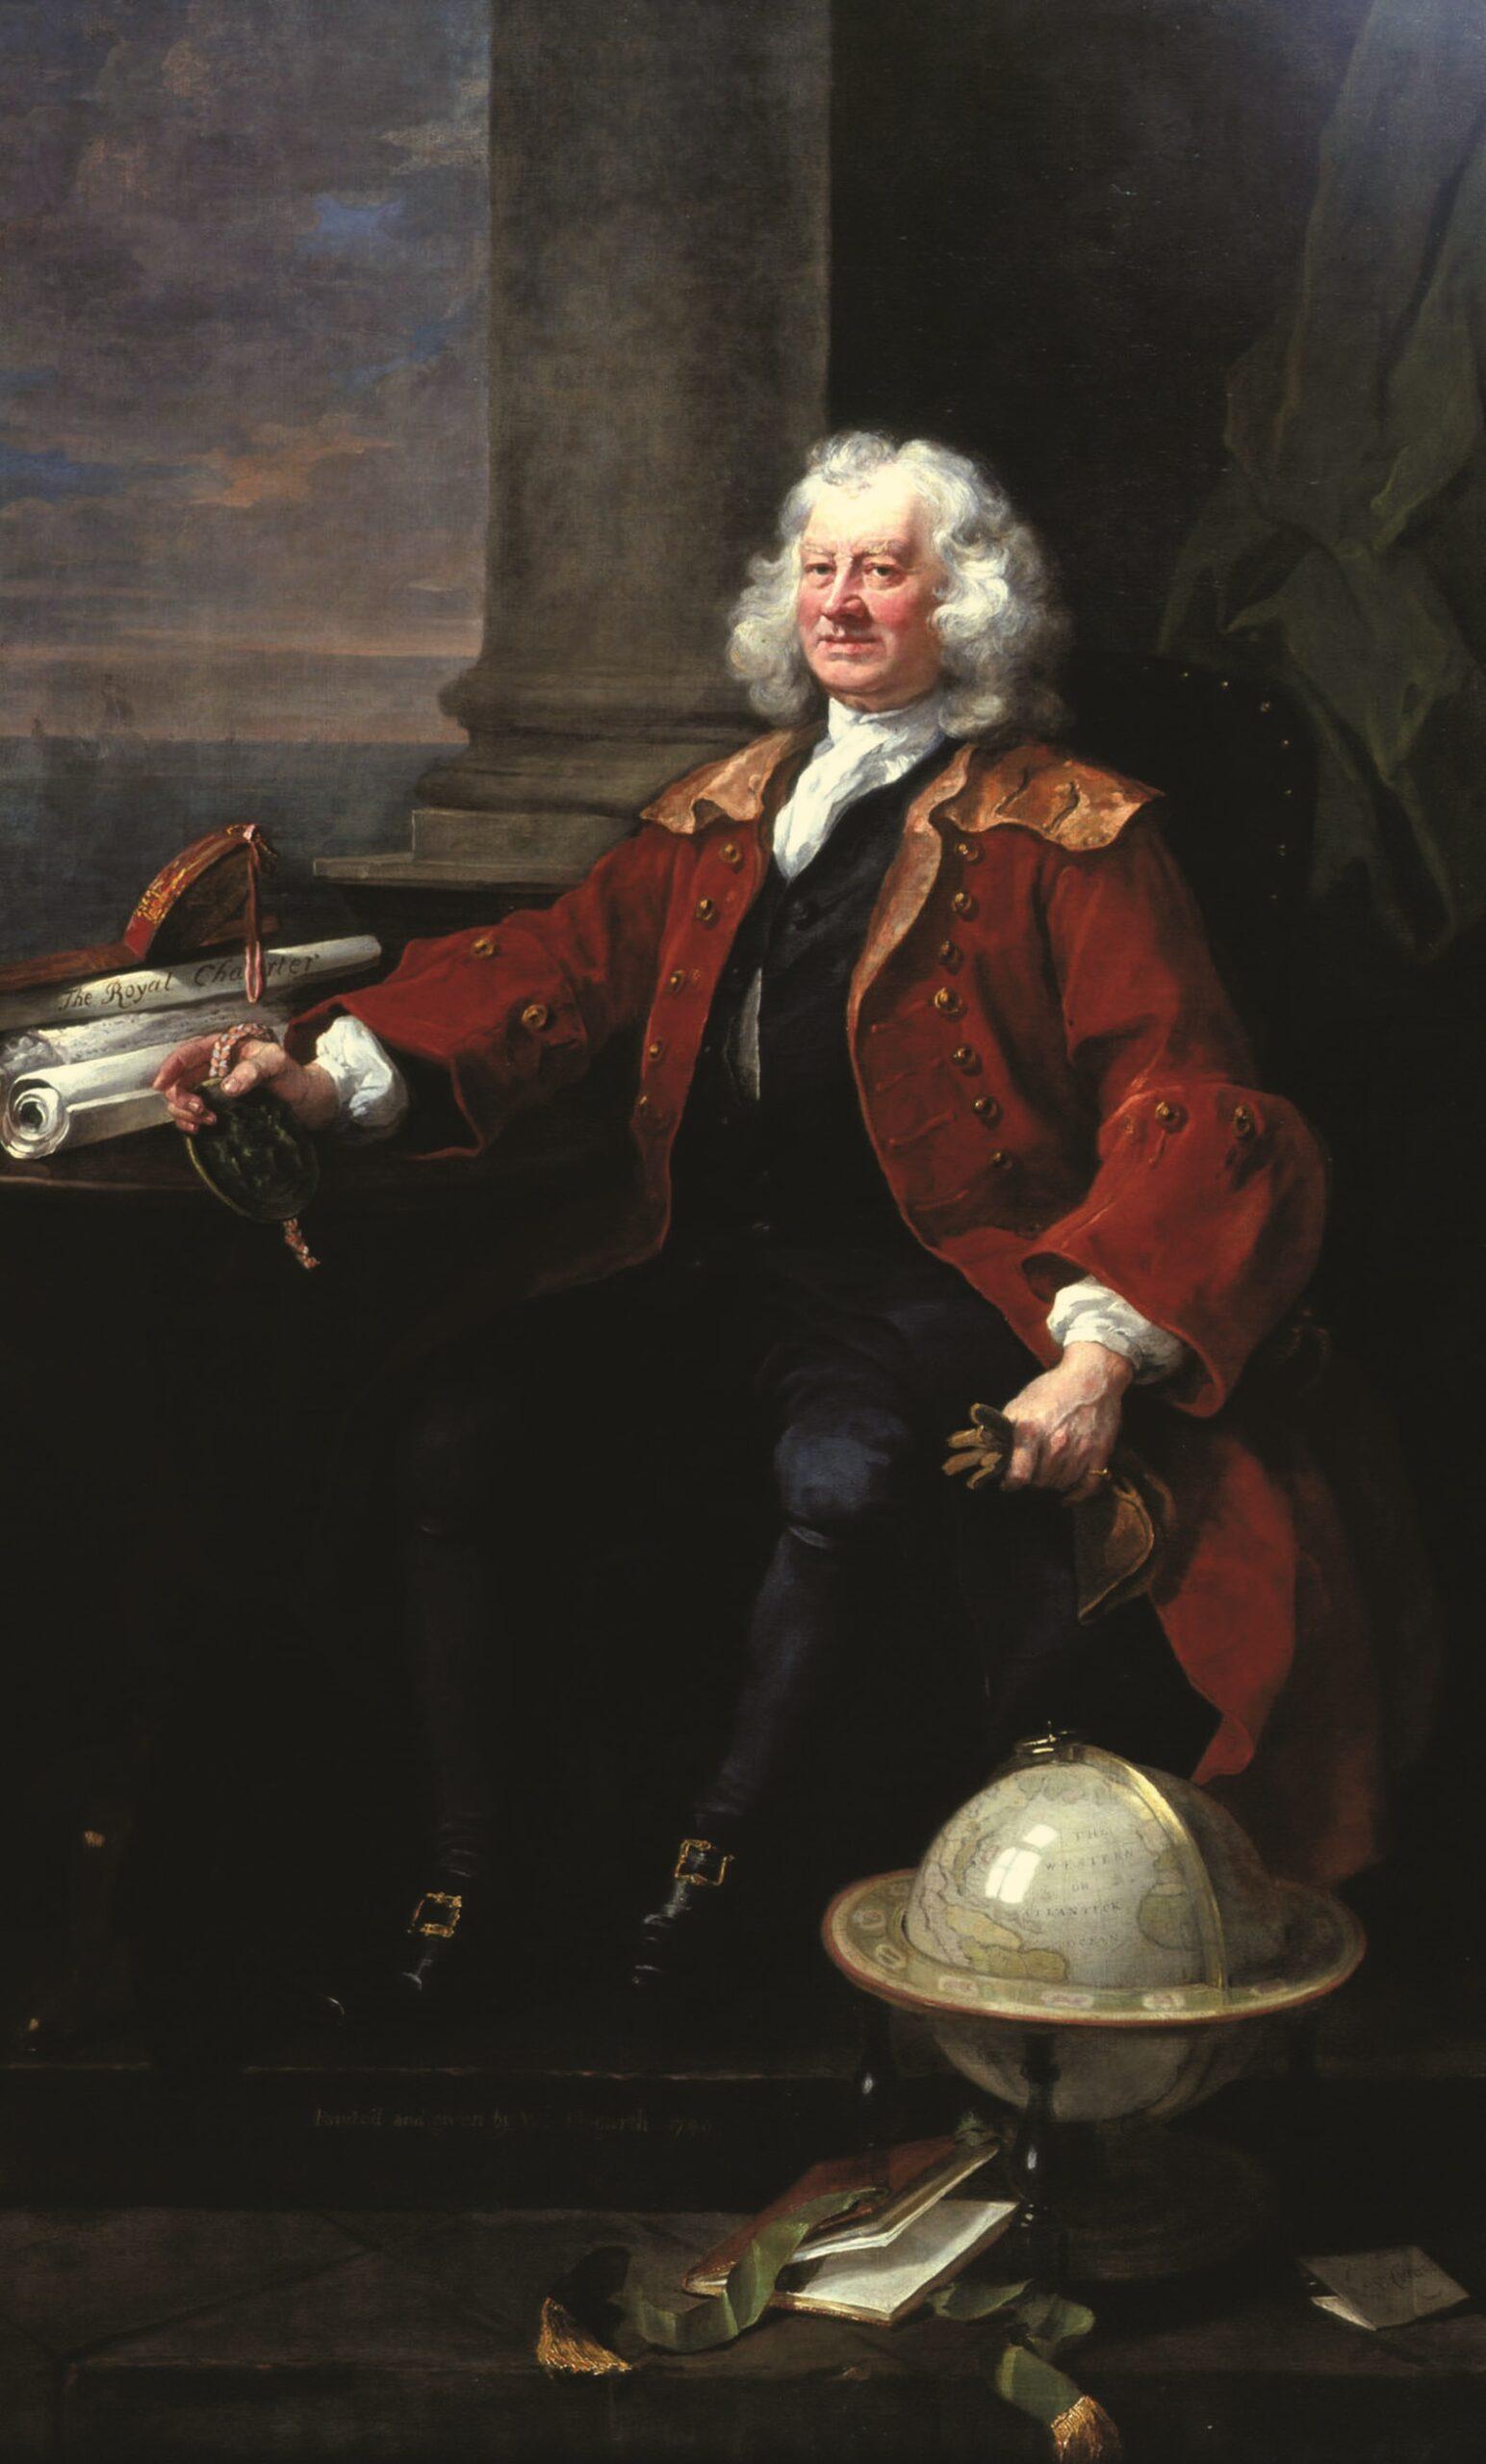 Portrait of Thomas Coram